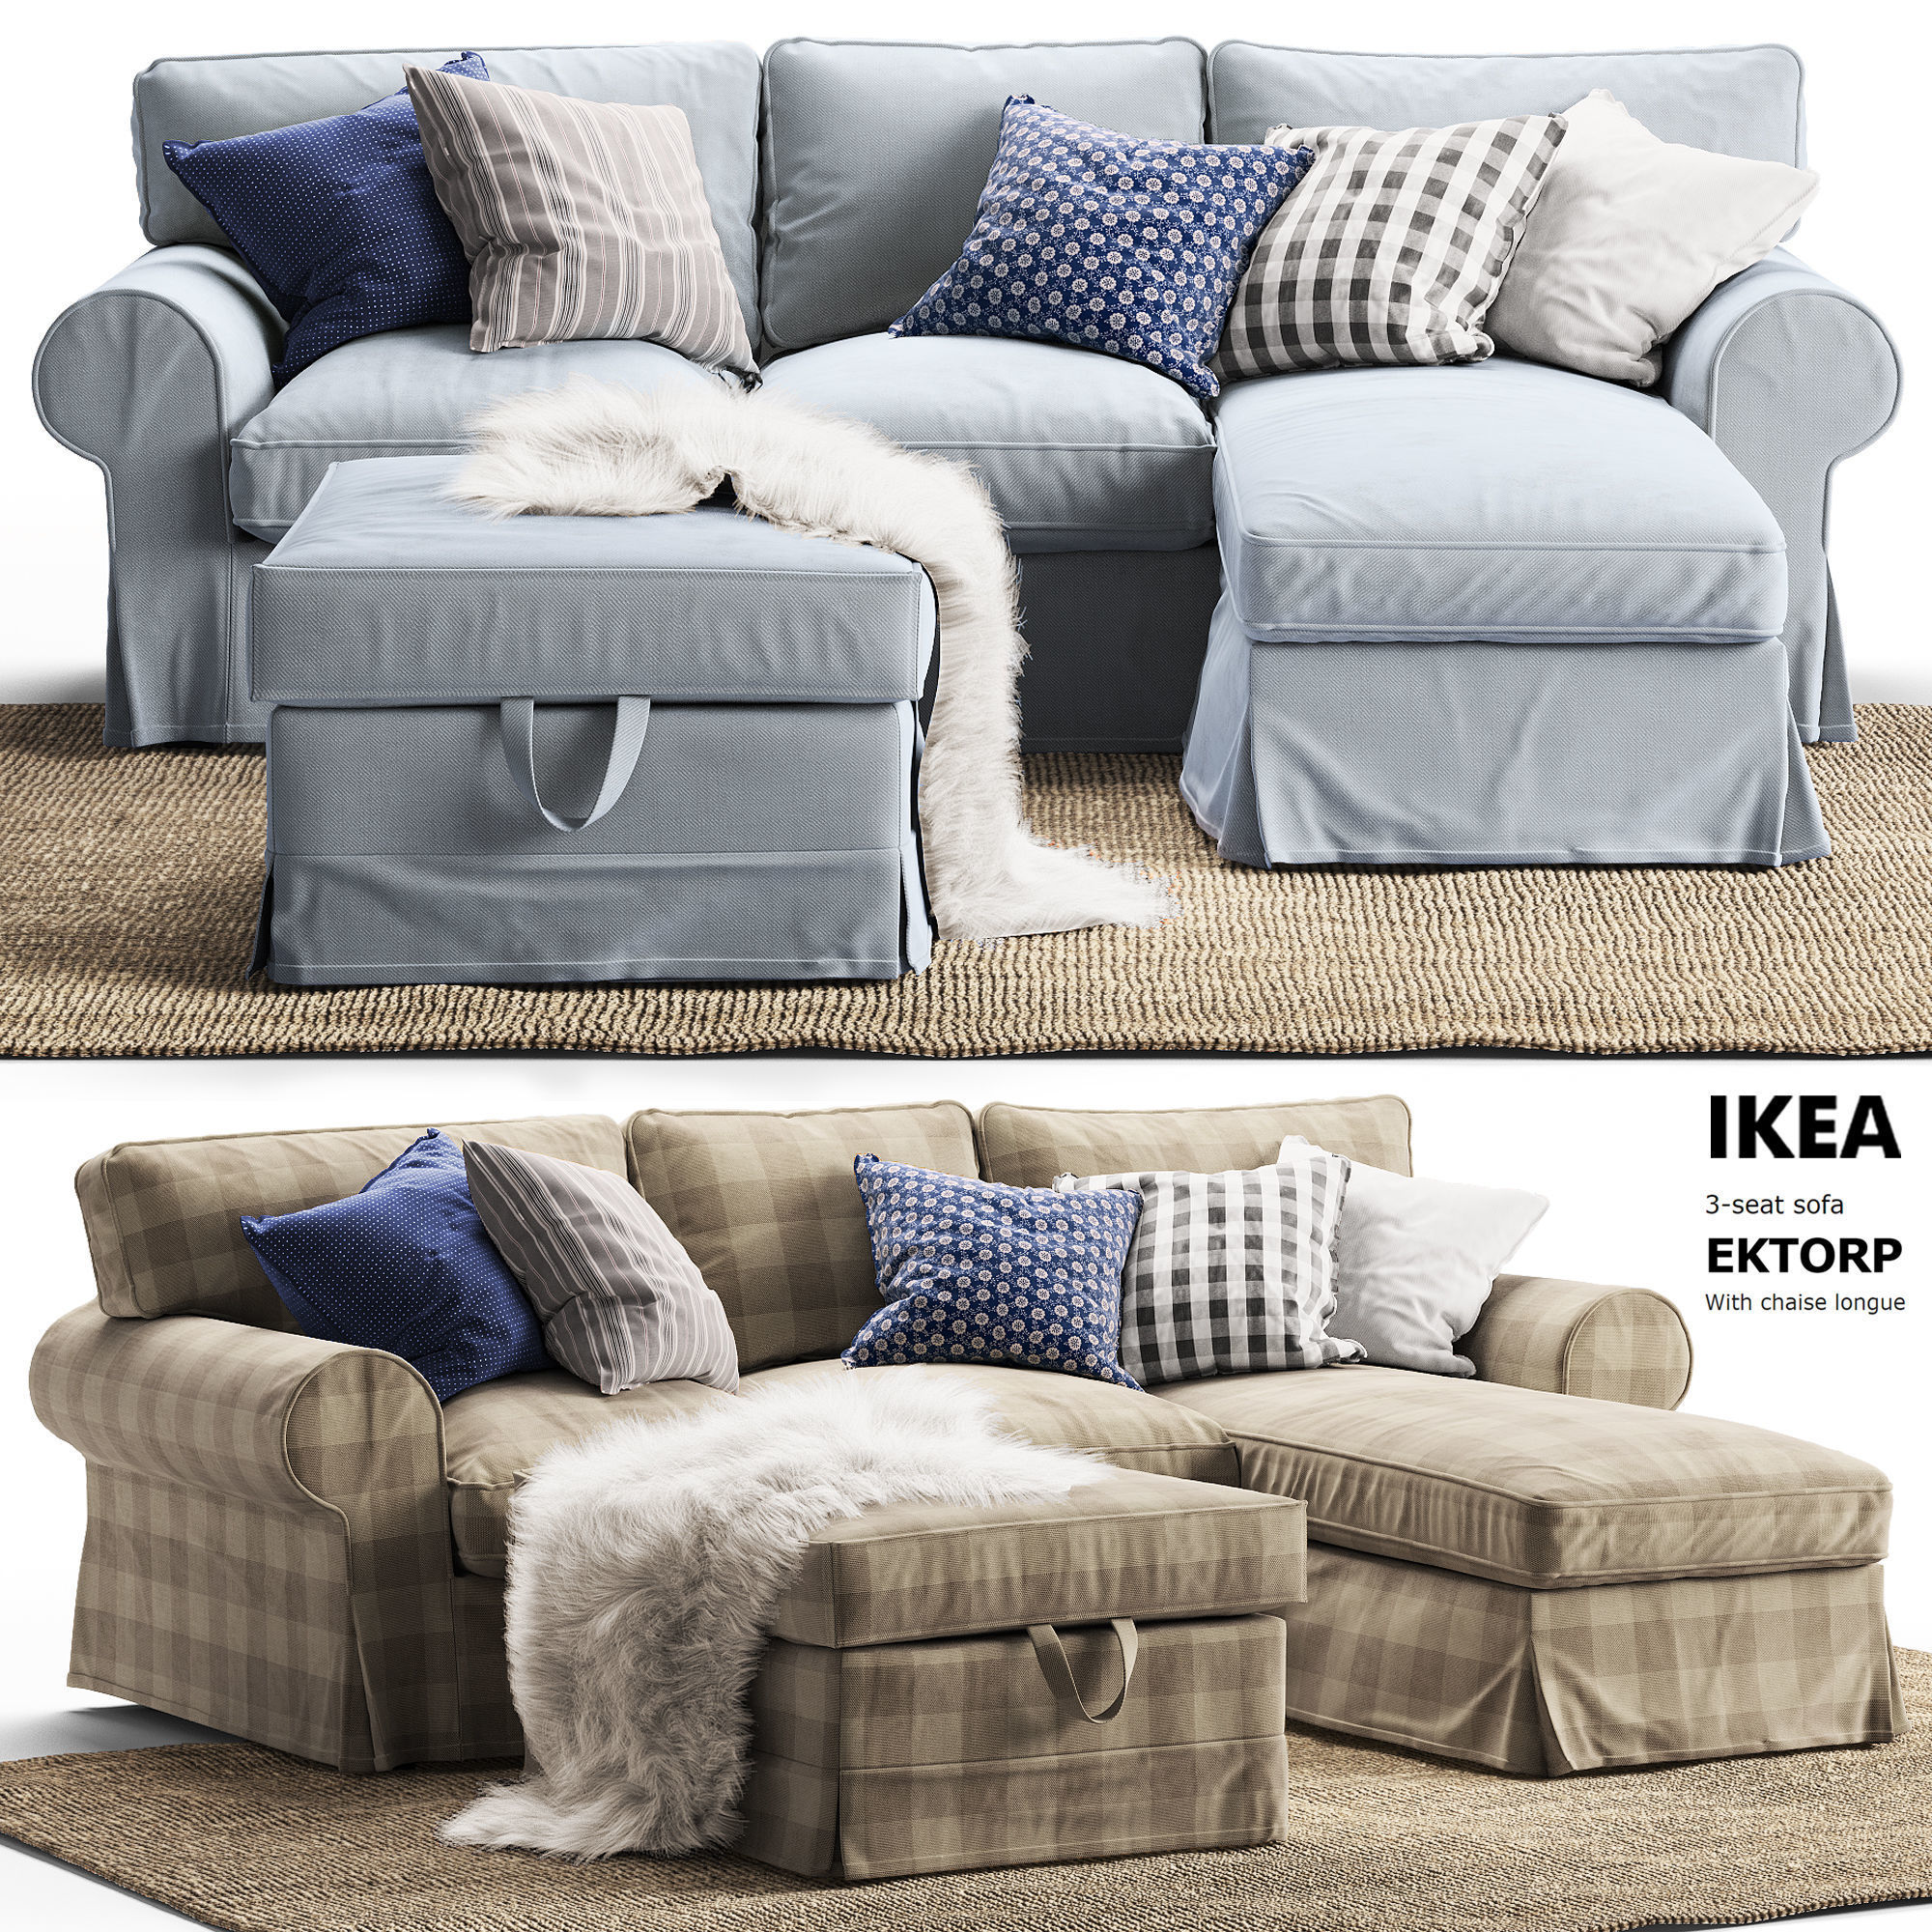 3d 3 Seat Sofa Ektorp With Chaise Longue Ikea Seating